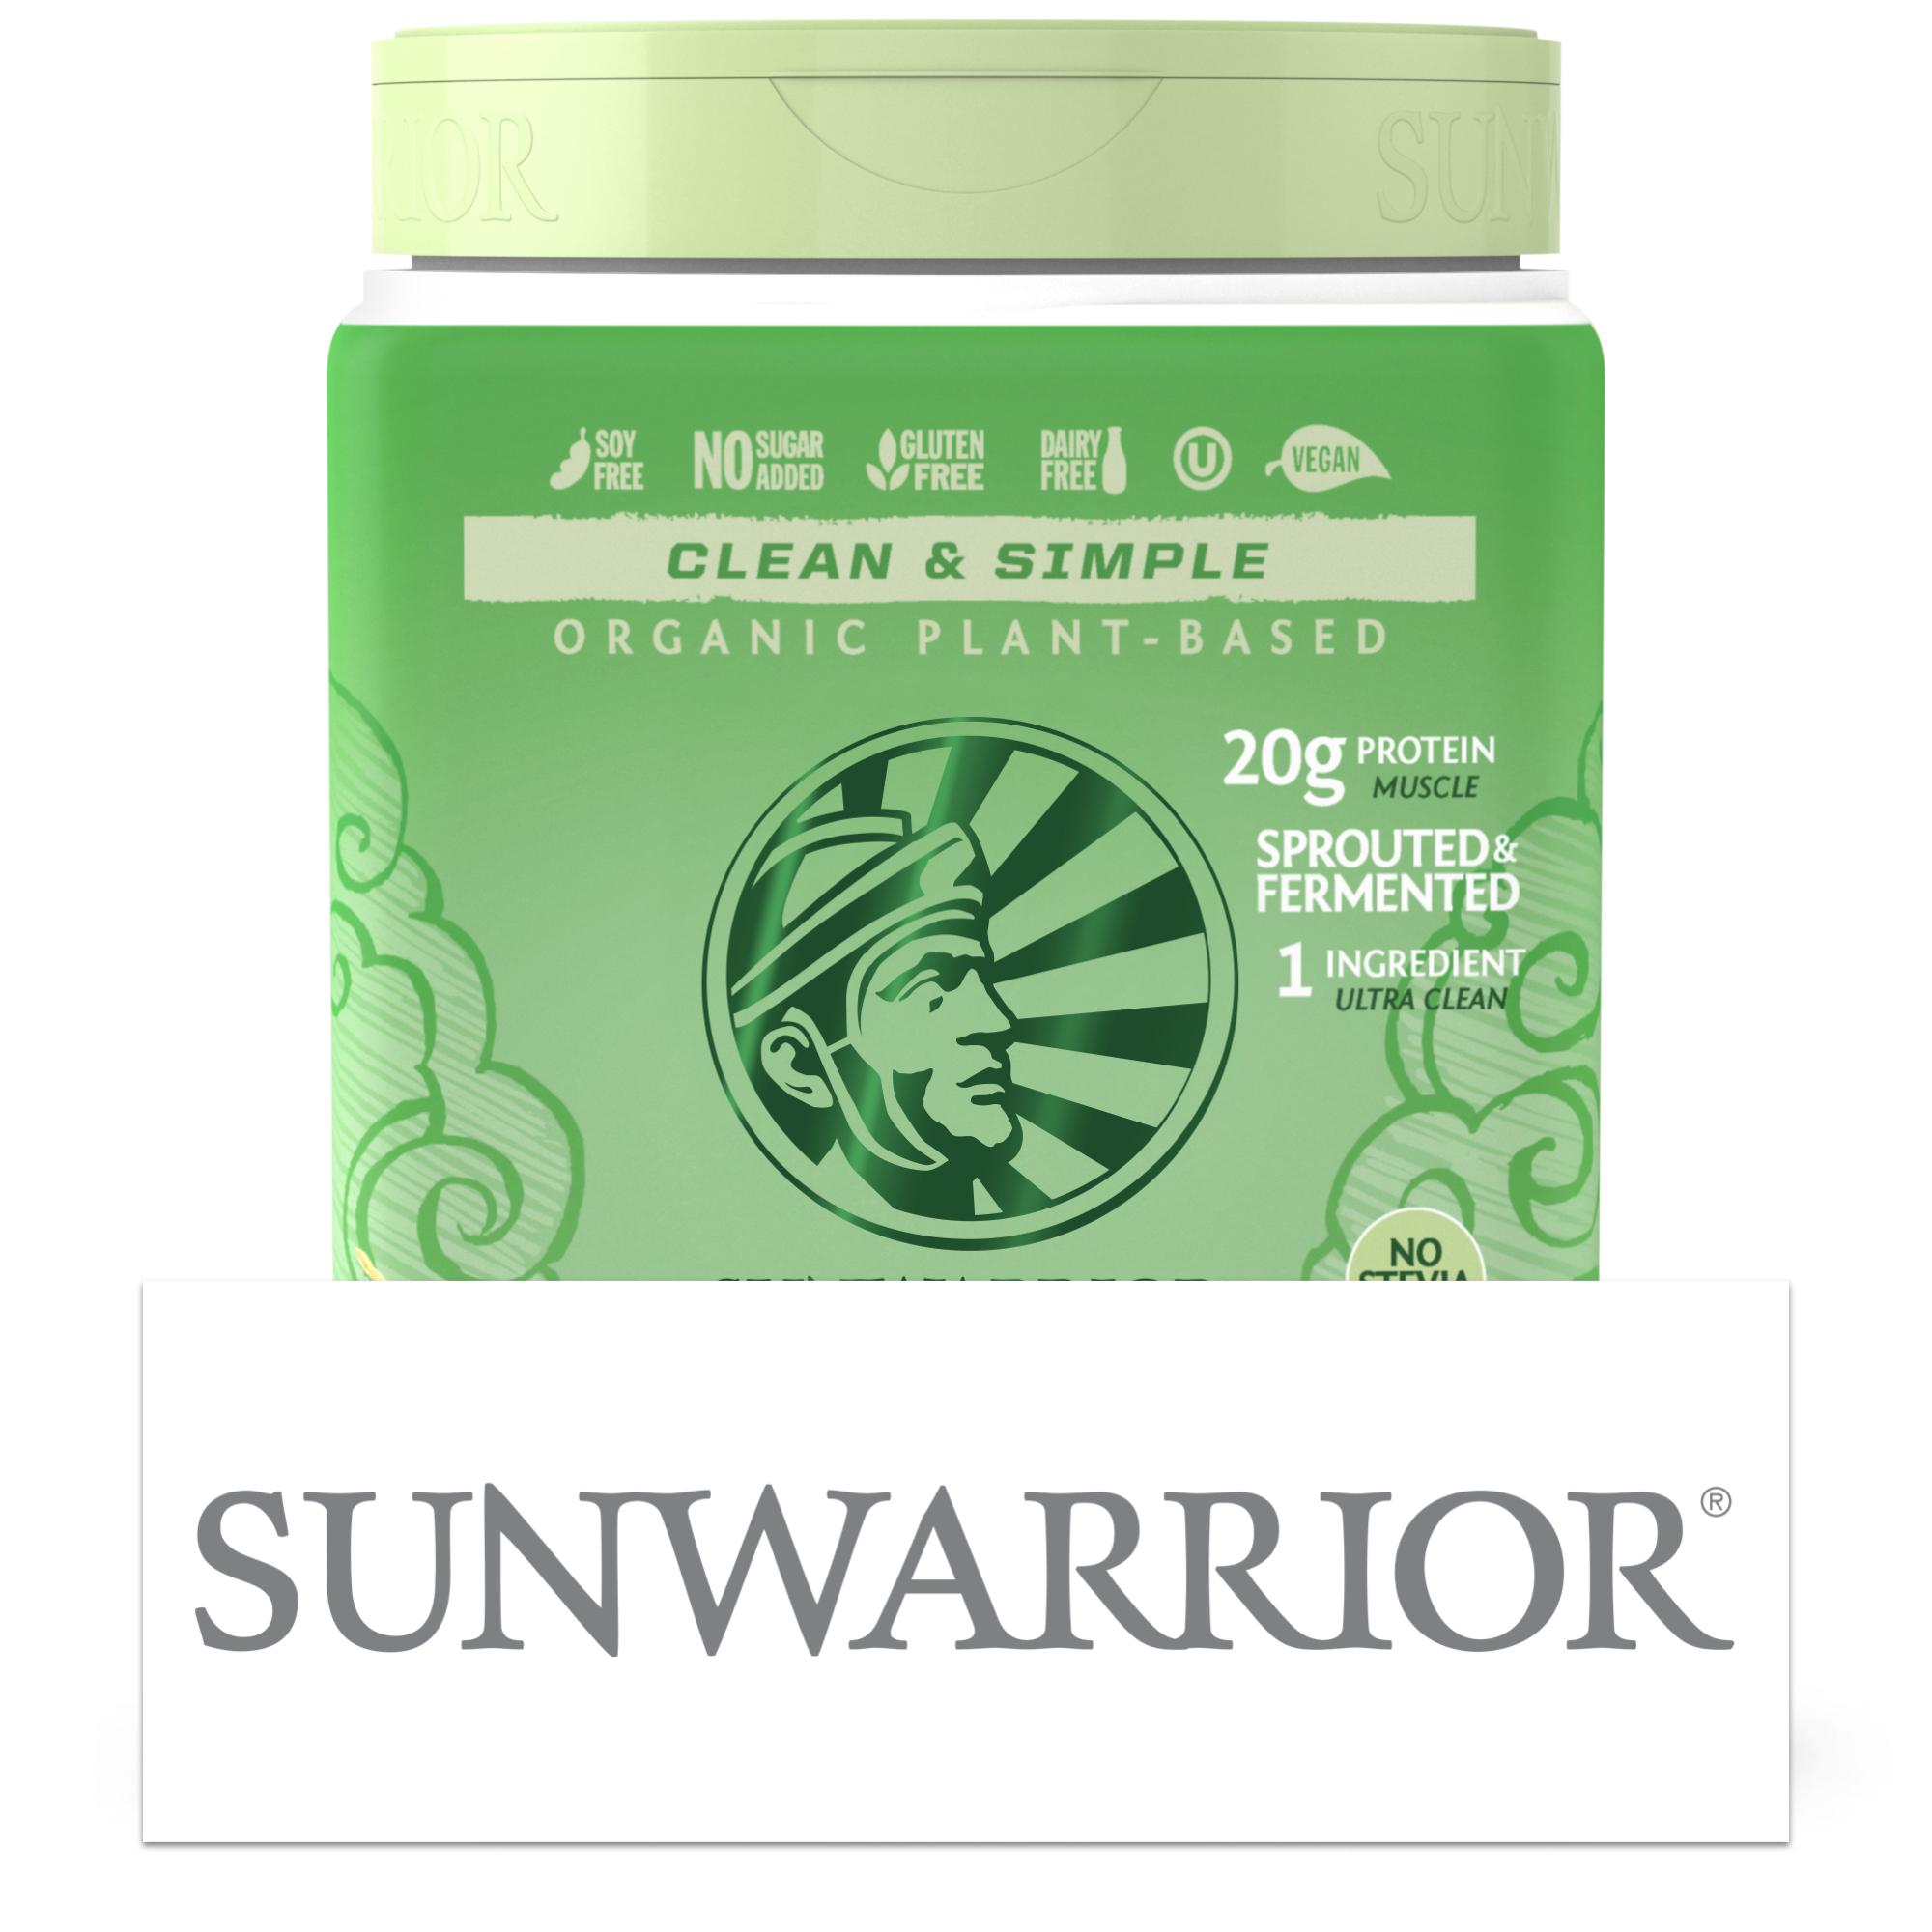 Sunwarrior CDS East 2019.001.jpeg